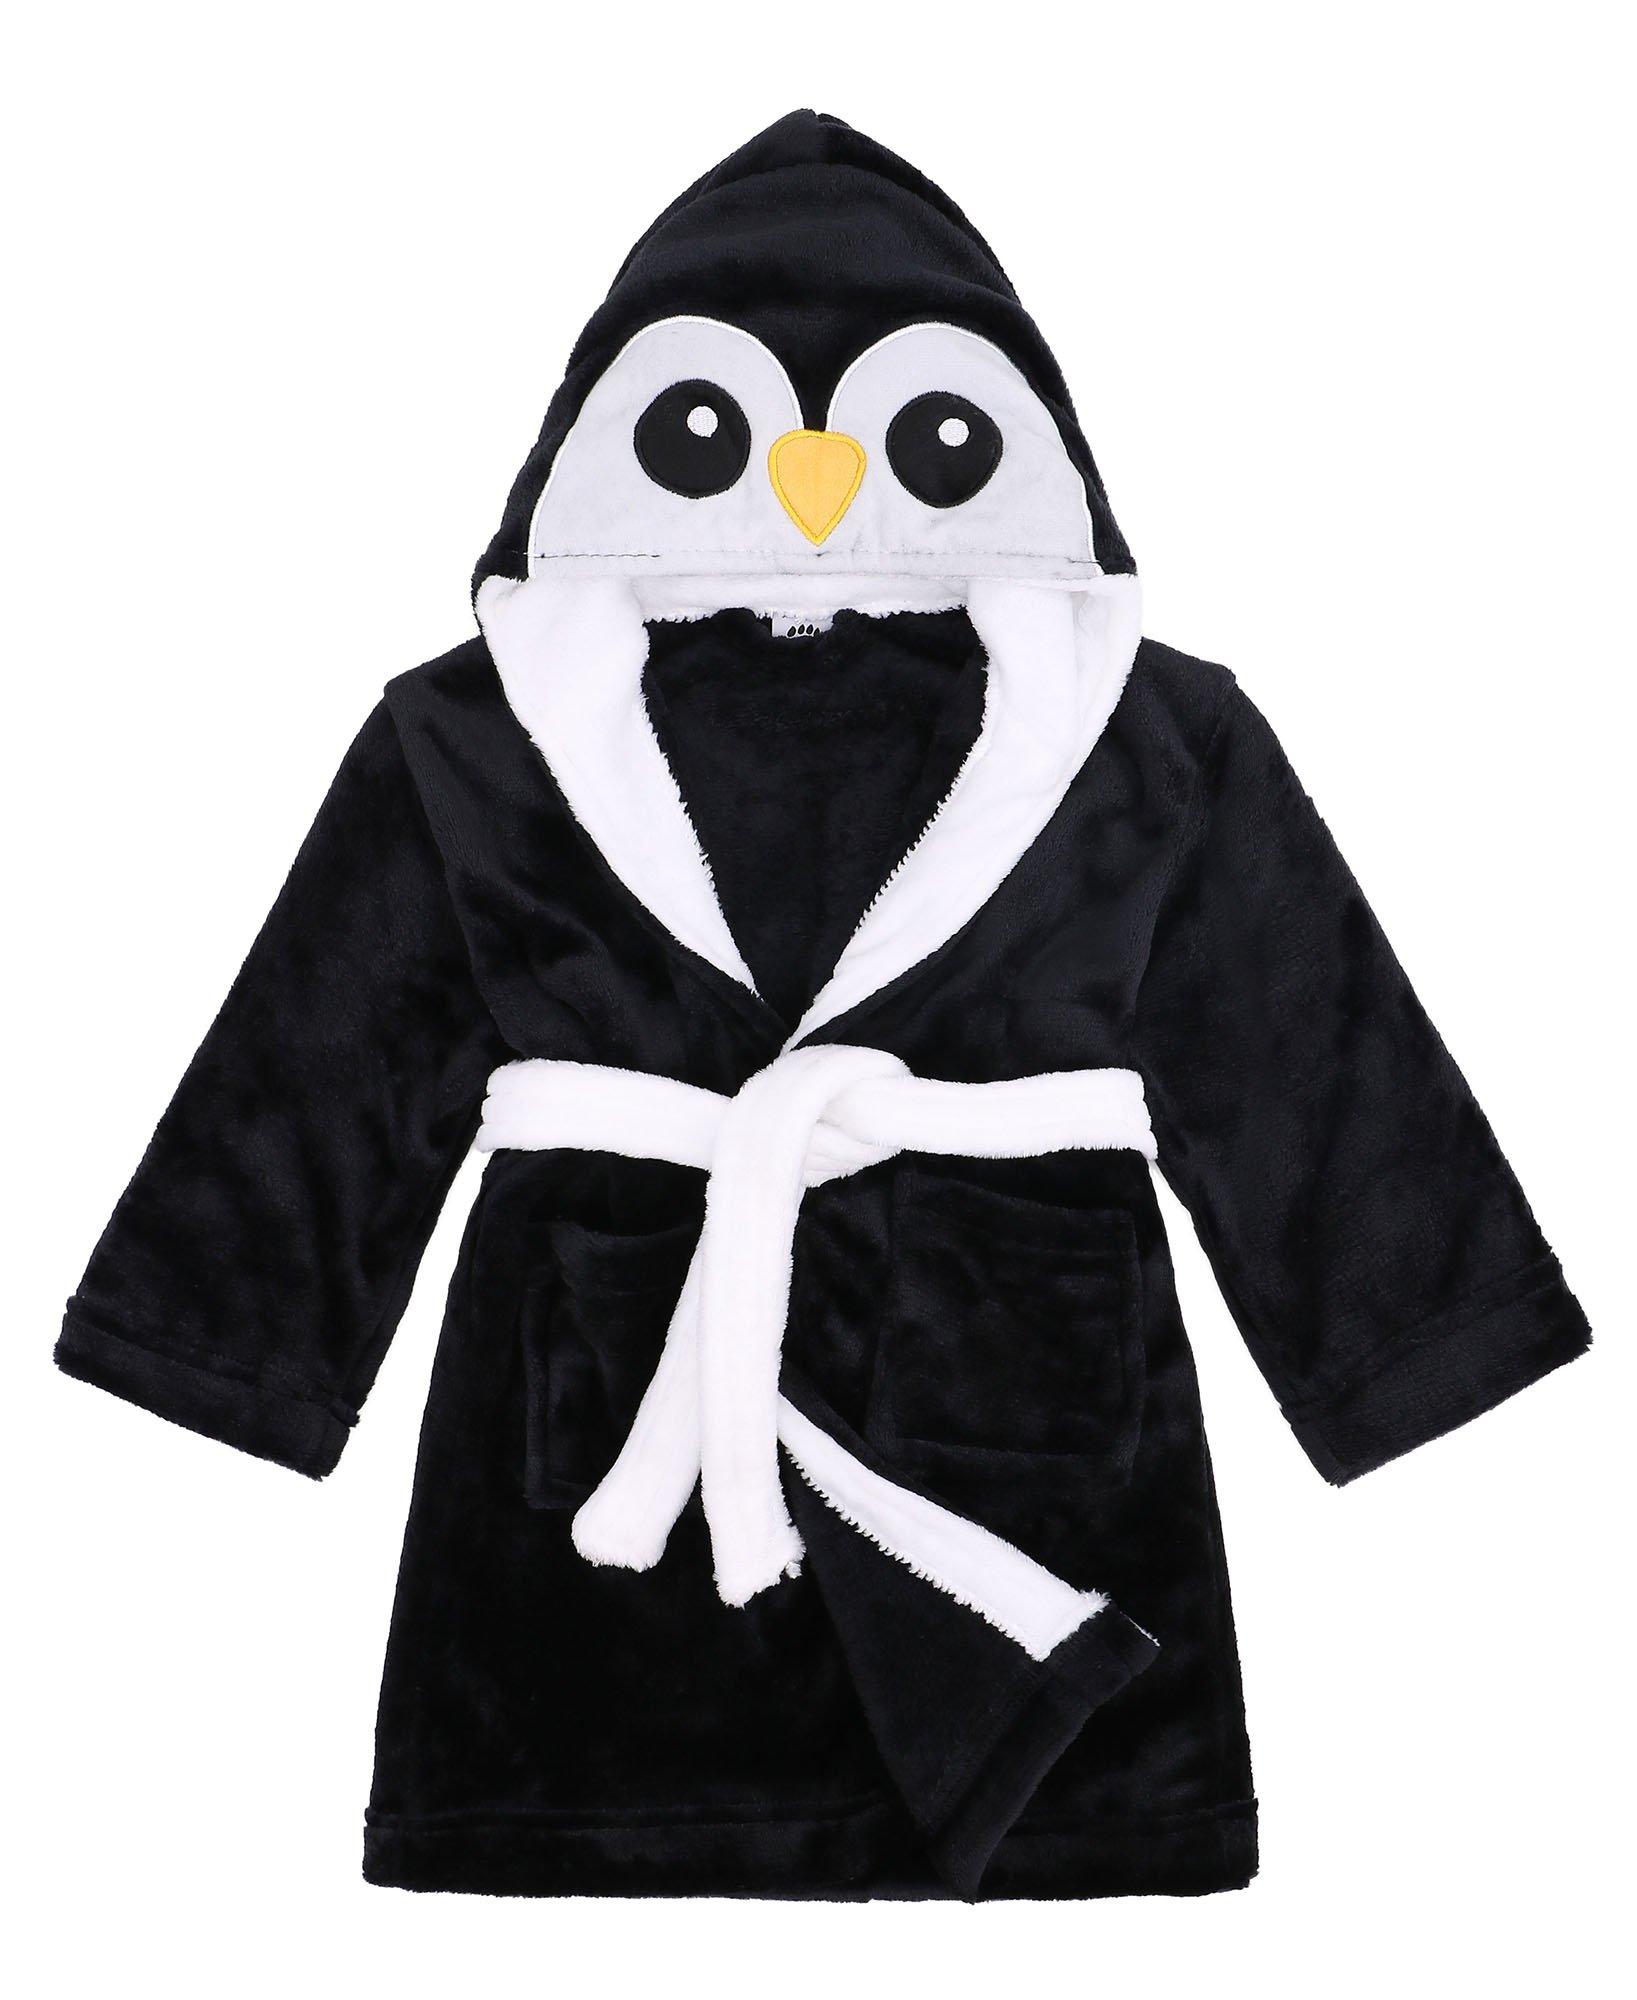 Children Robe Animal Adventure Soft Hooded Terry Bathrobe,Penguin,S(1-3 Year)